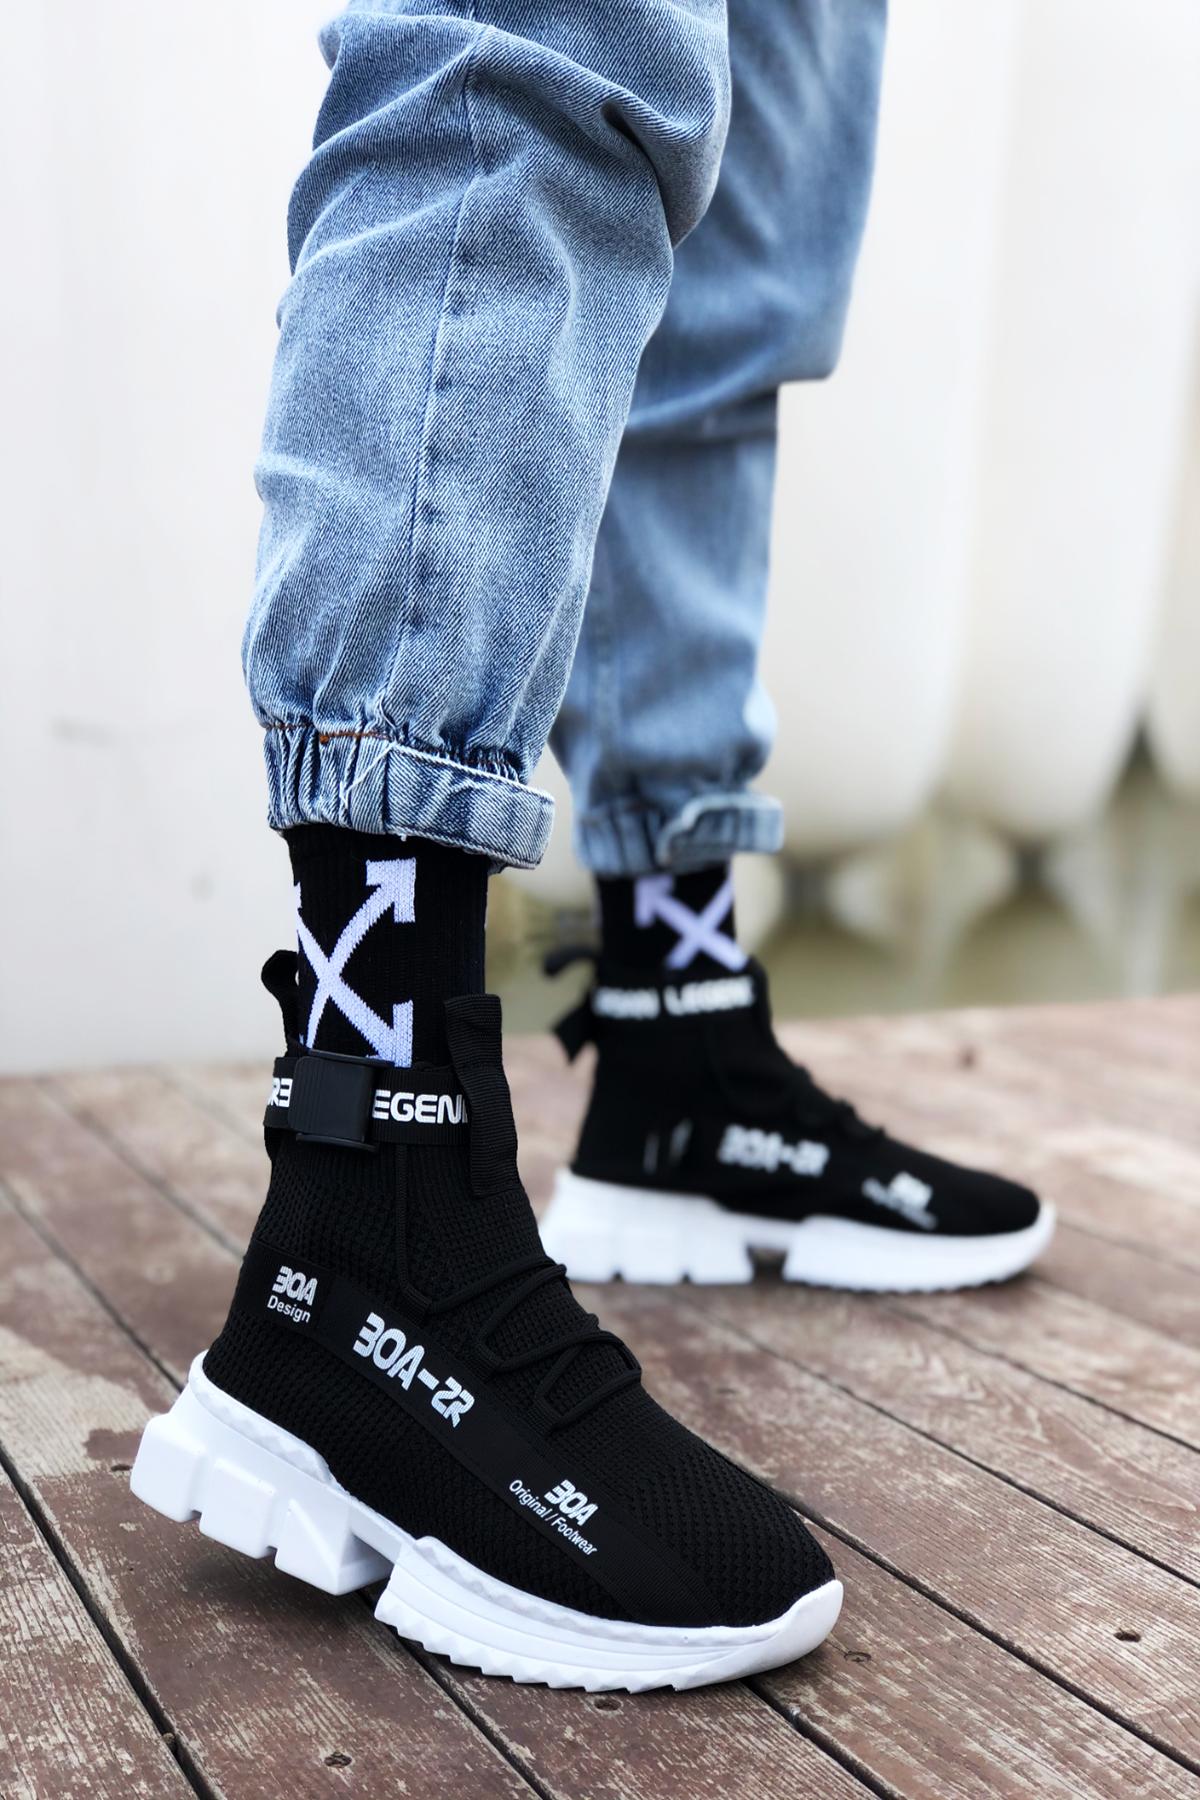 B700 Siyah BT Erkek Sneakers